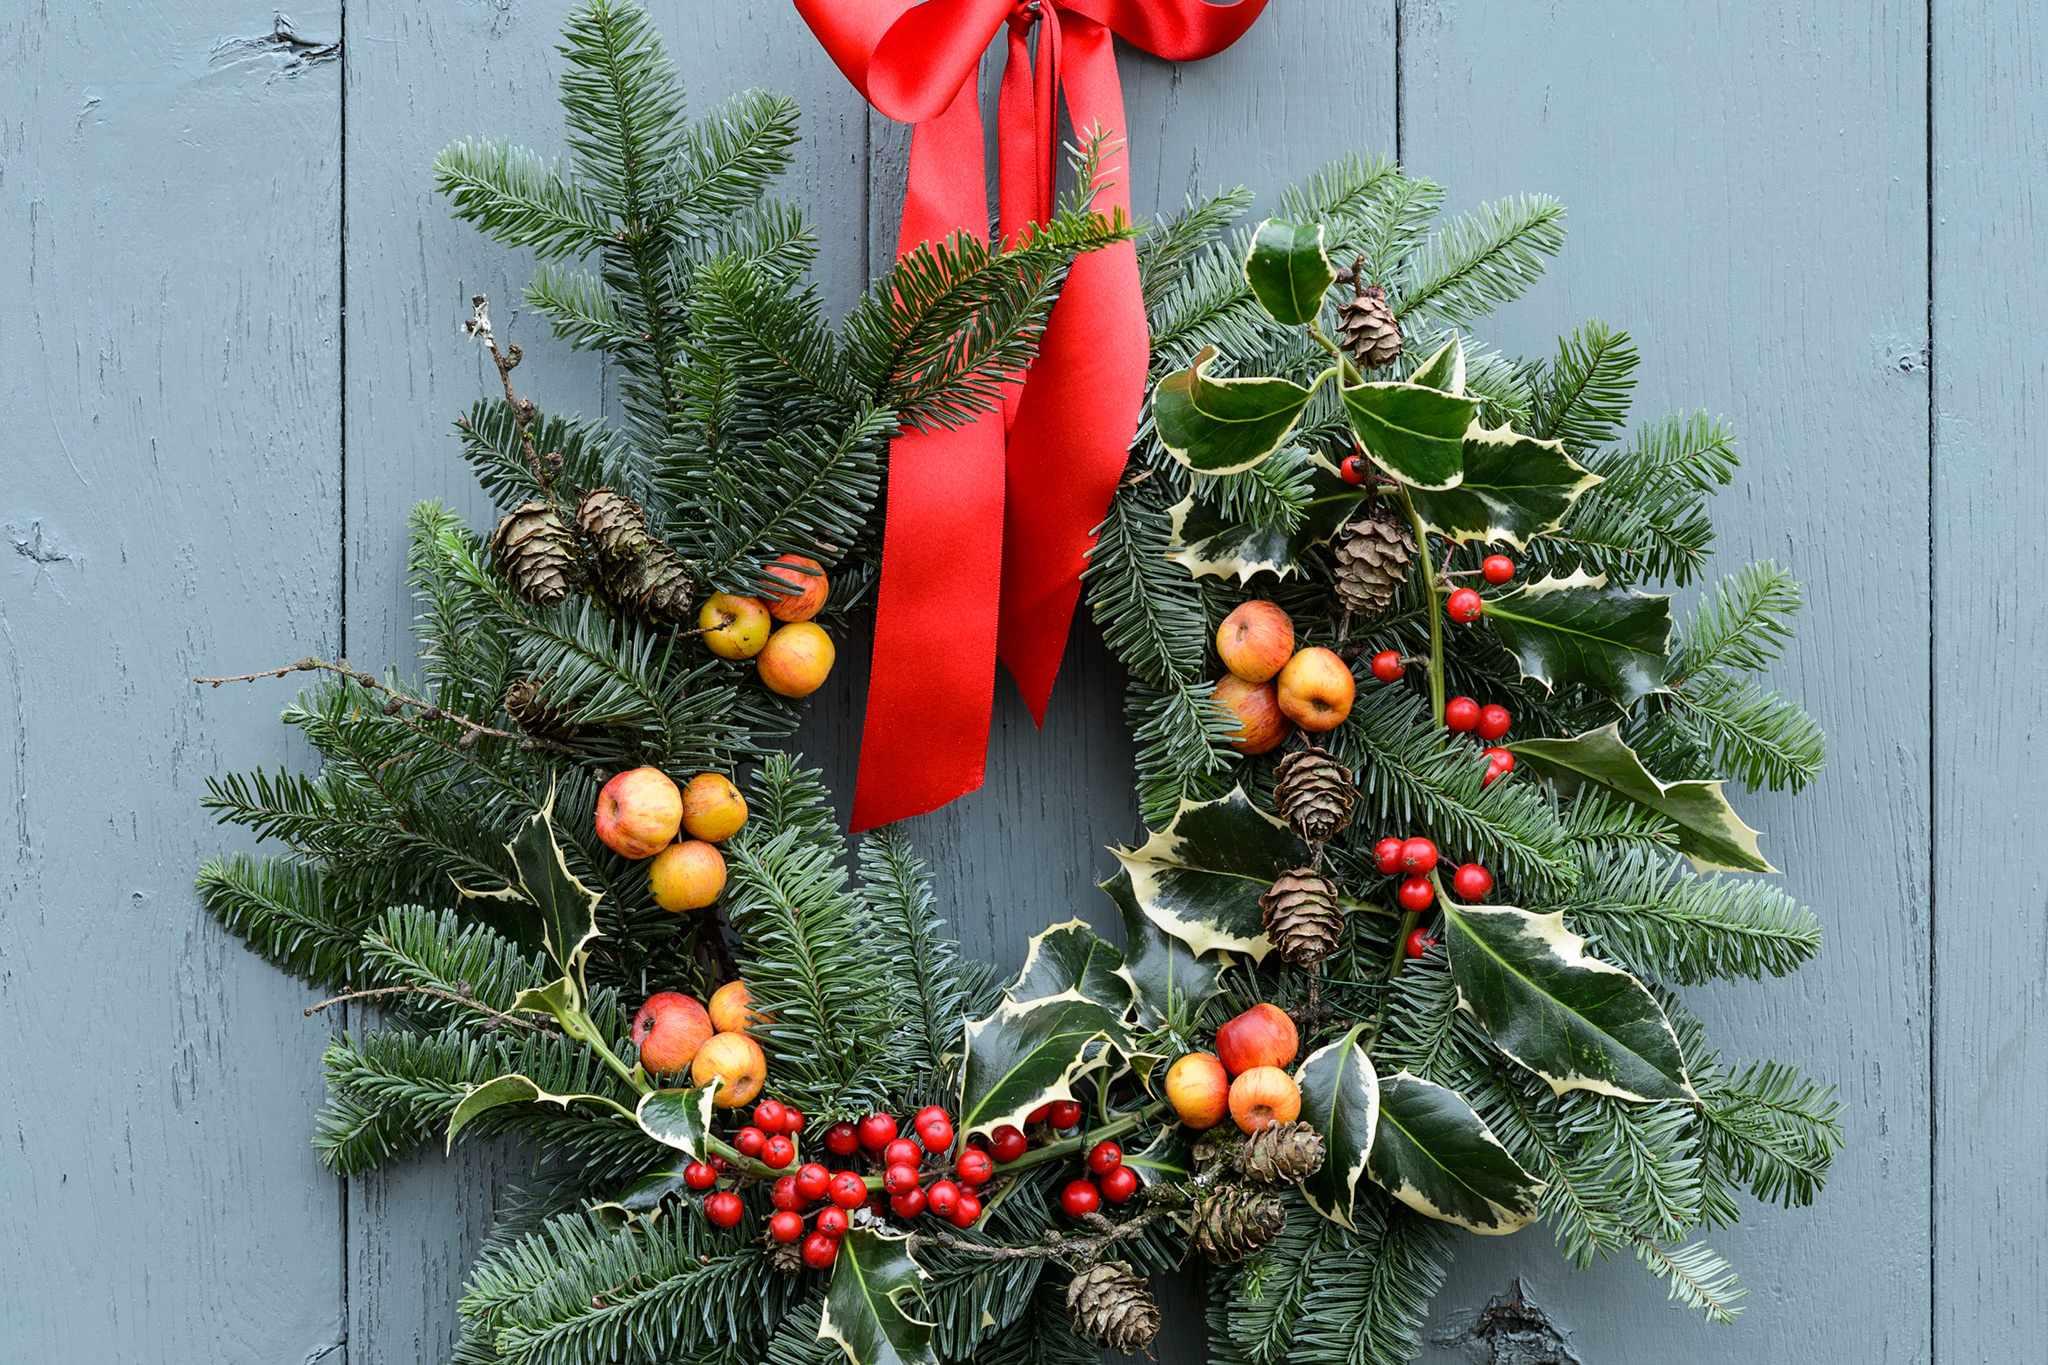 How To Make a Festive Wreath